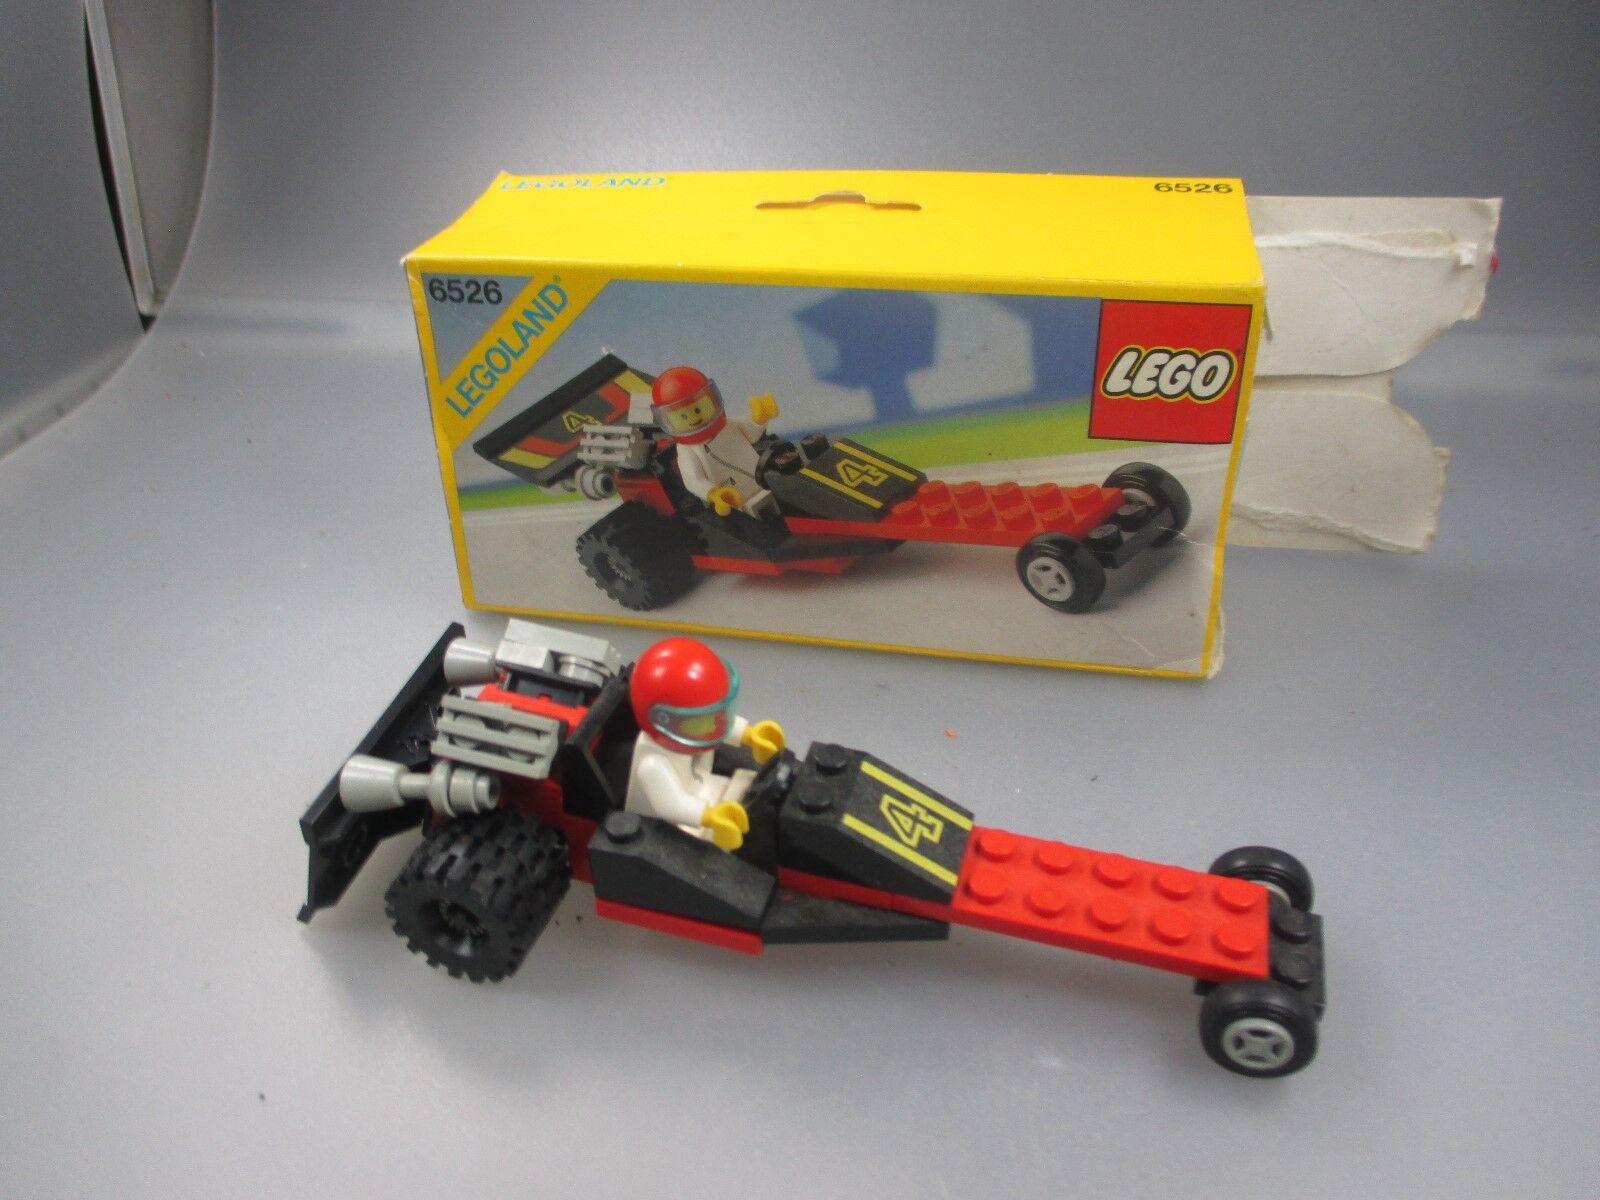 Lego 6526 Legoland rot Line Racer   Rote Linie Racer (Stiege50)